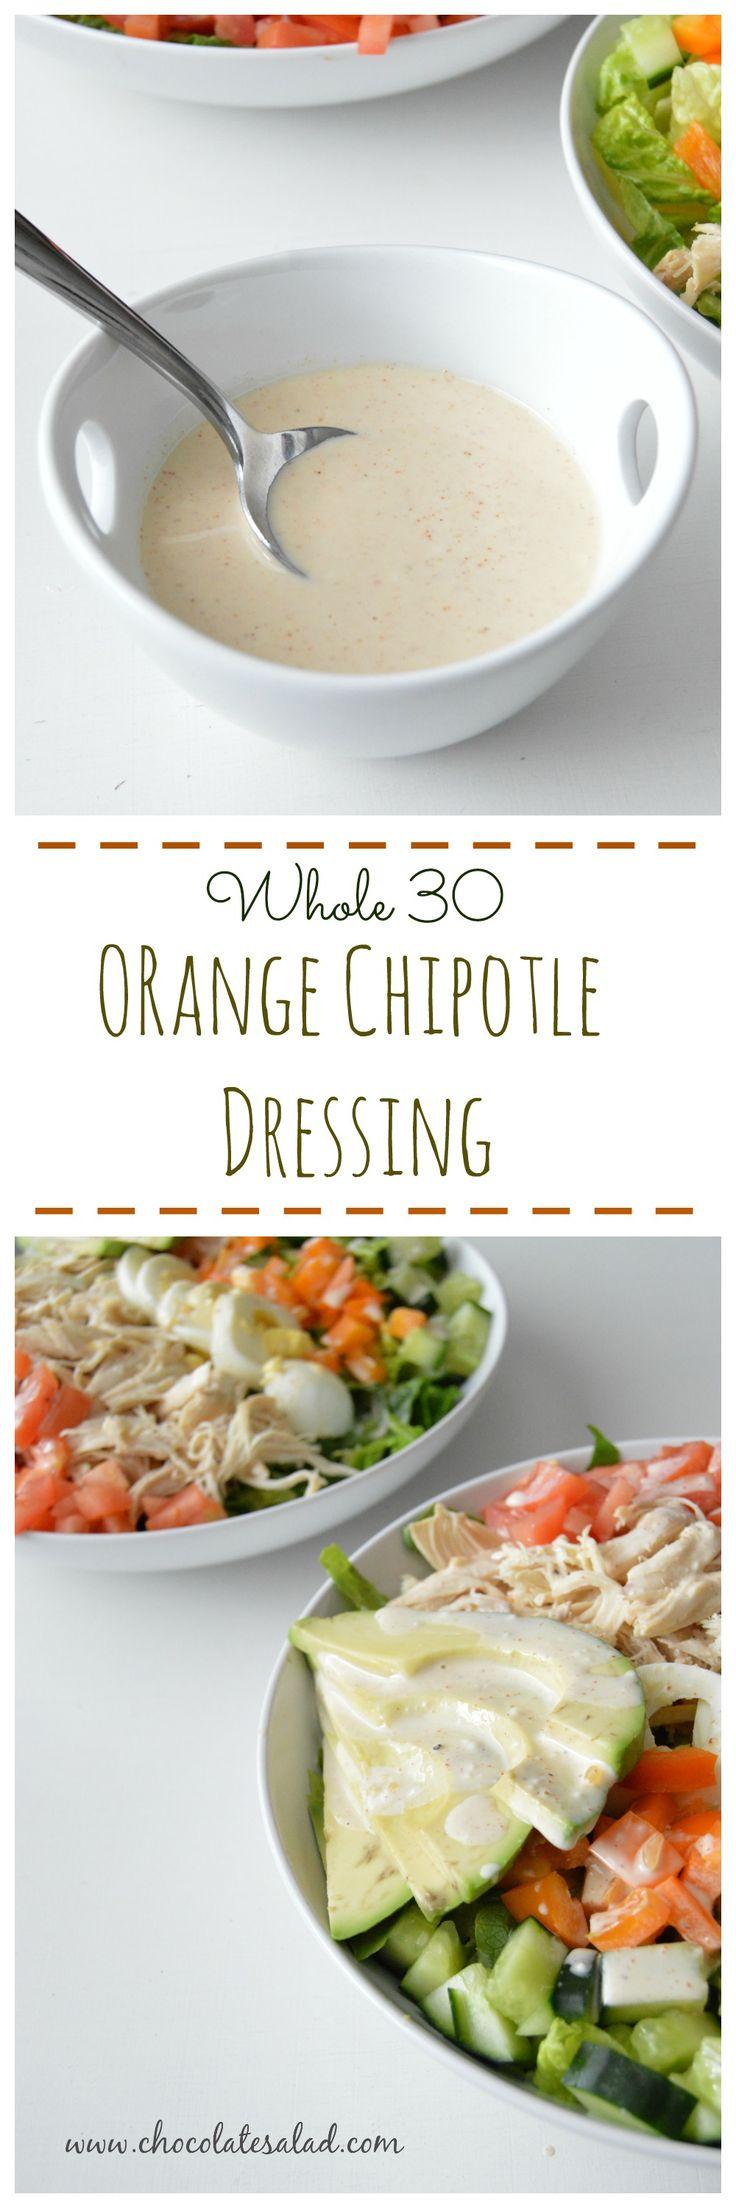 Creamy orange chiptole dressing that works for the Whole 30! on chocolatesalad.com